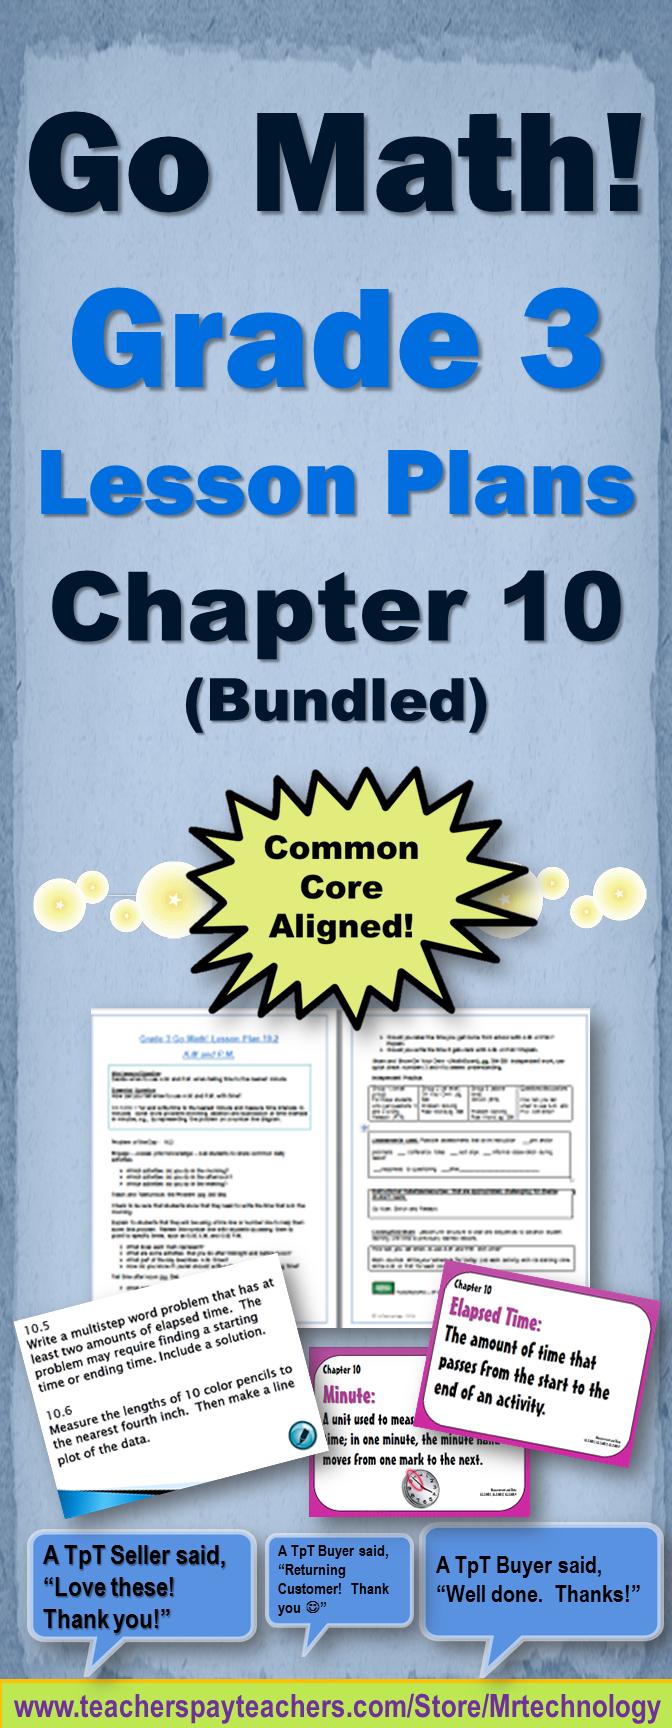 go math grade 3 chapter 10 lessons 10 1 10 9 w journal. Black Bedroom Furniture Sets. Home Design Ideas